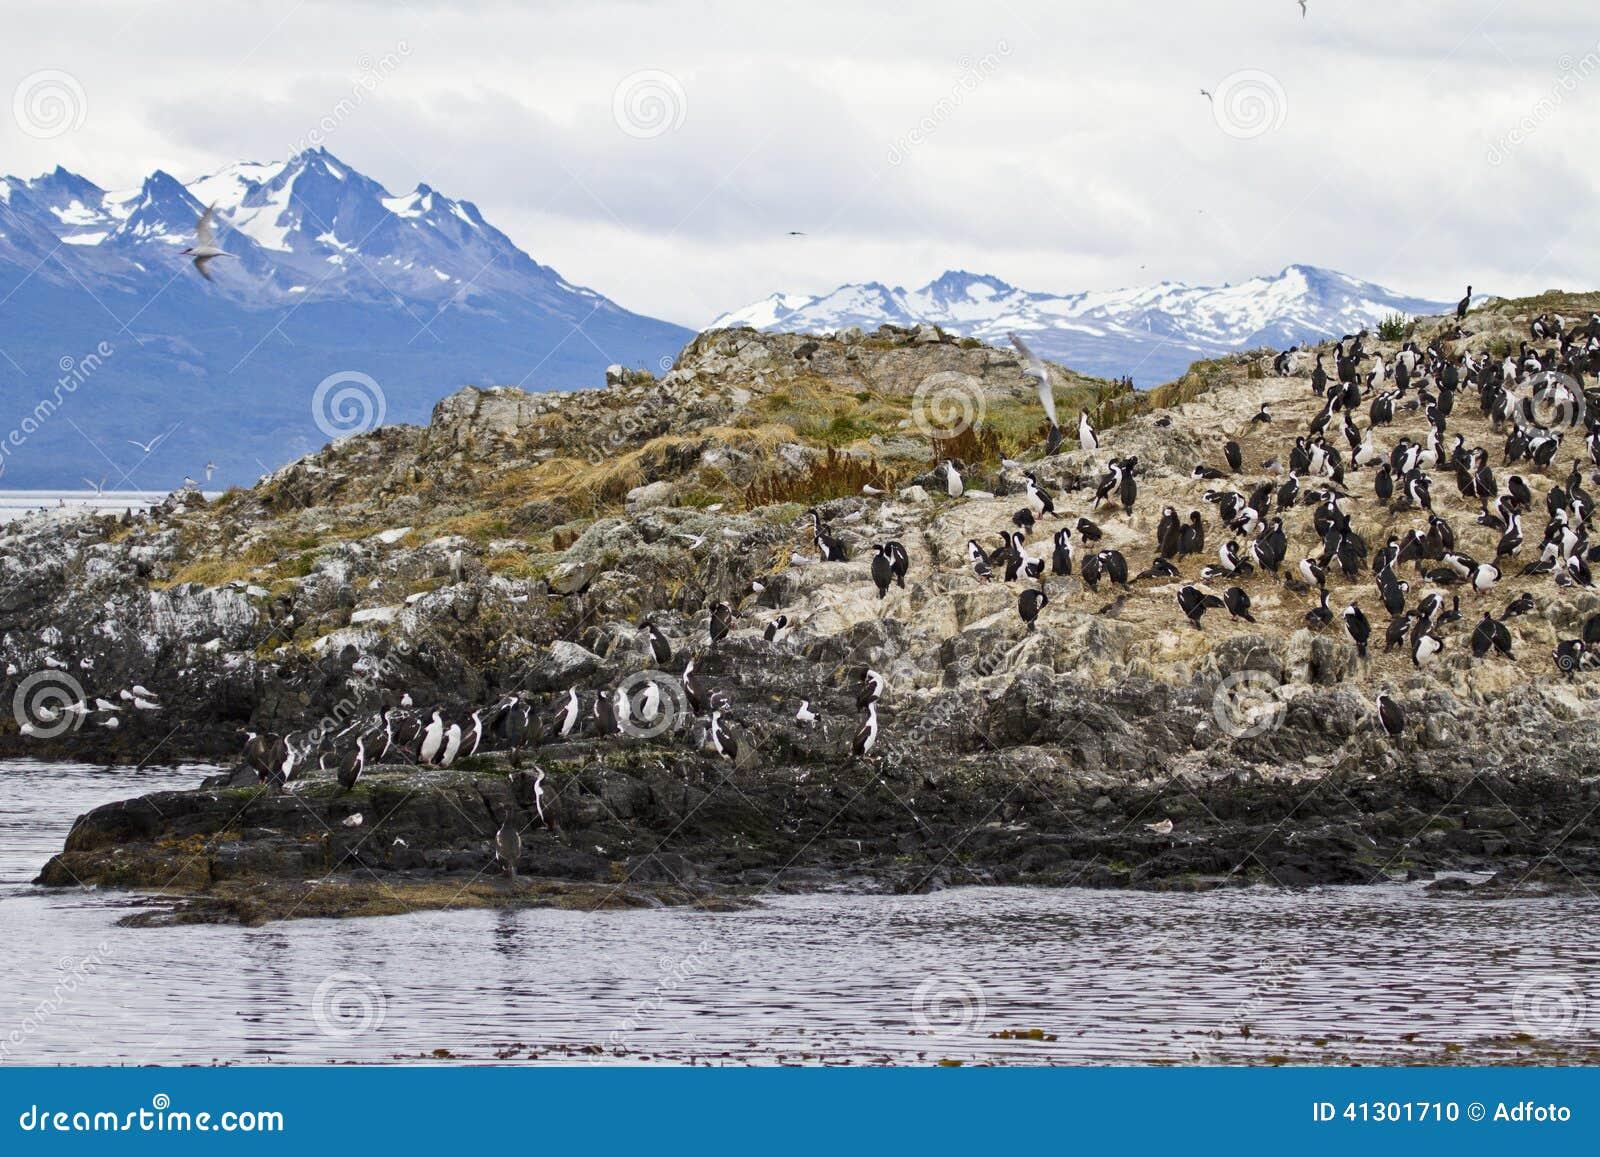 Birds - Cormorant Colony